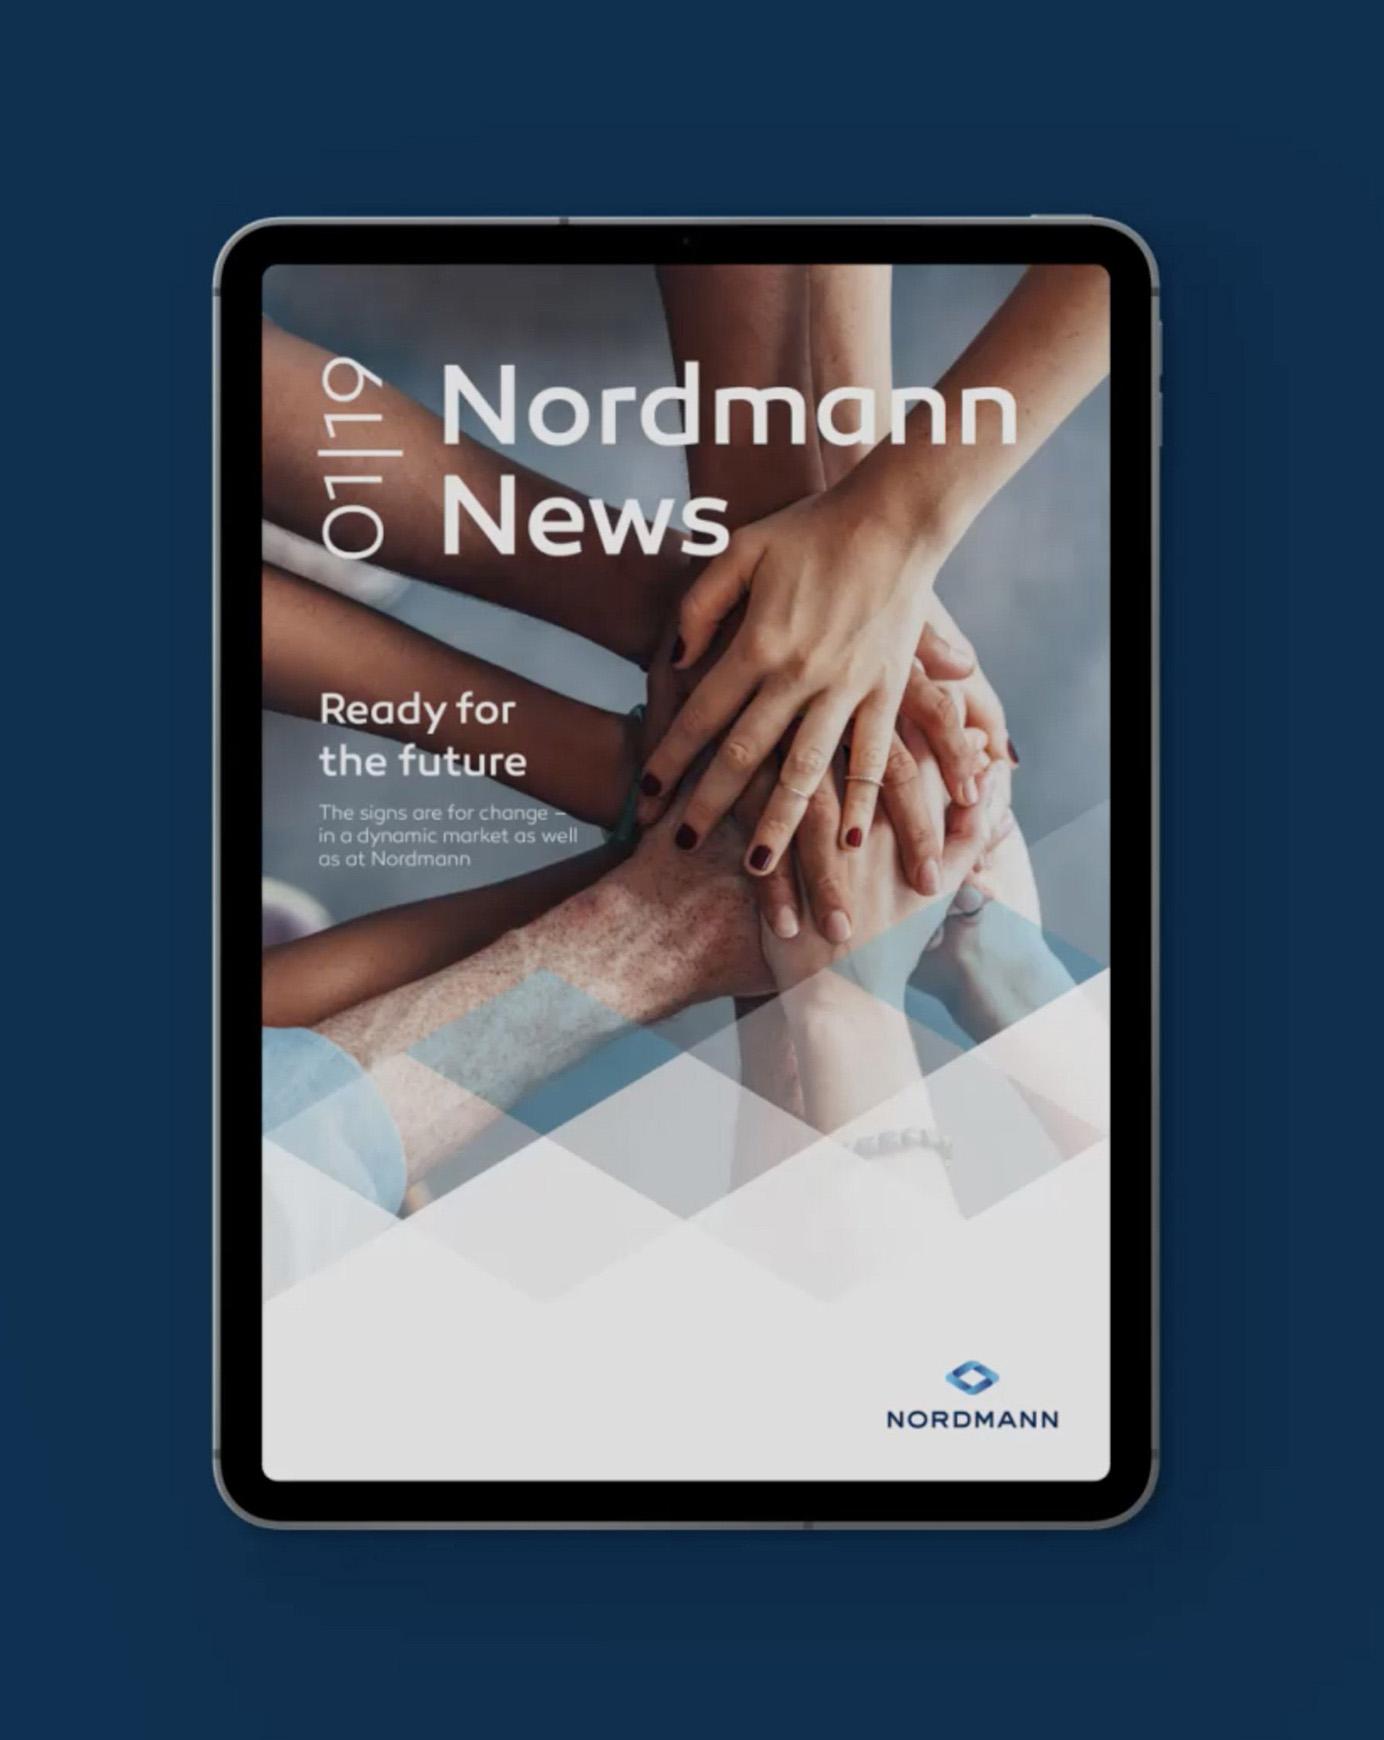 nordmann branding